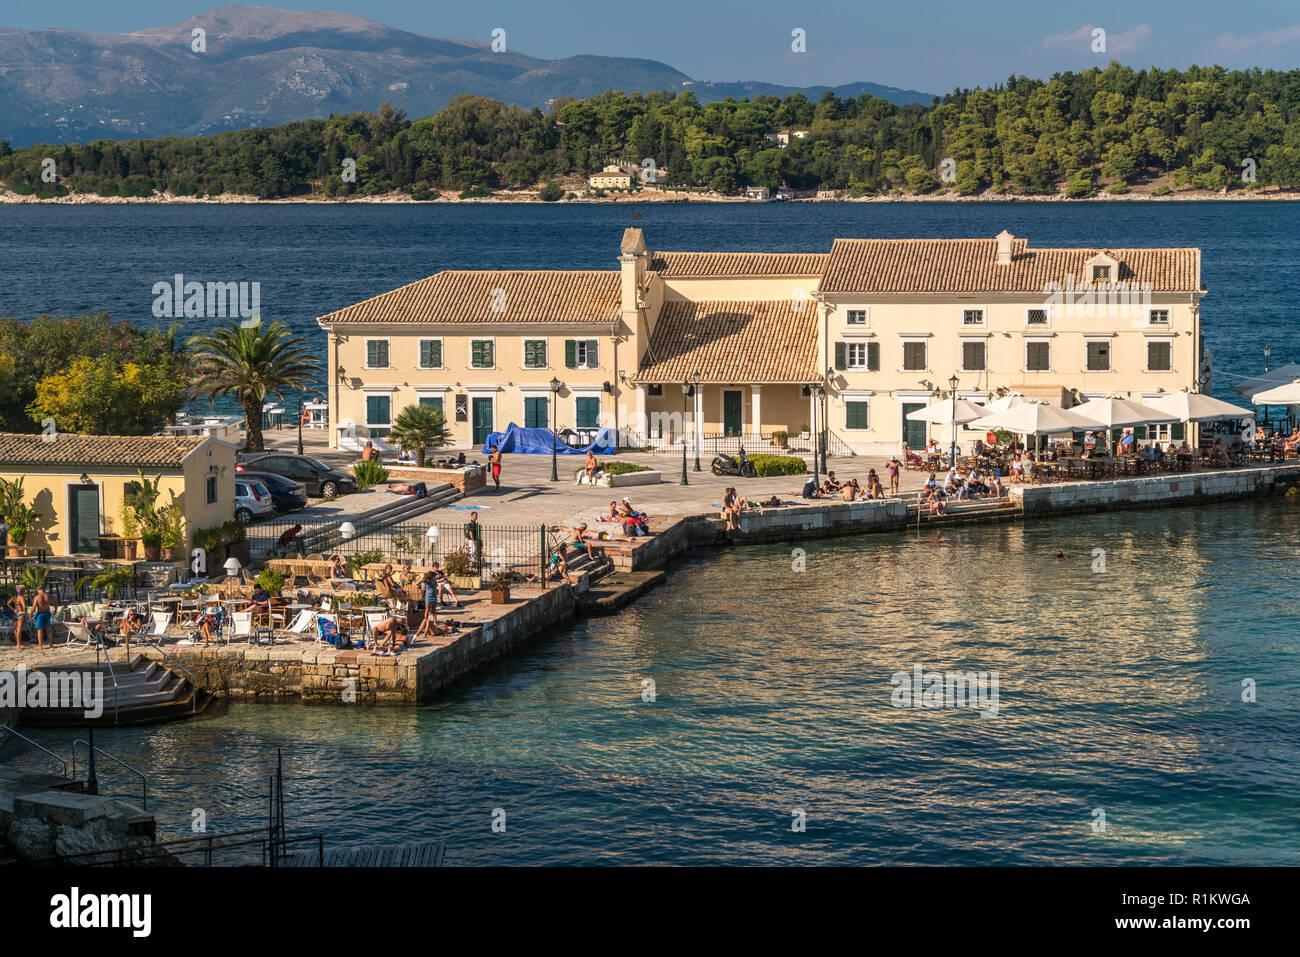 Faliraki Beach in Korfu Stadt, Kerkyra, Griechenland, Europa |  Faliraki Beach in Corfu town, Greece, Europe - Stock Image